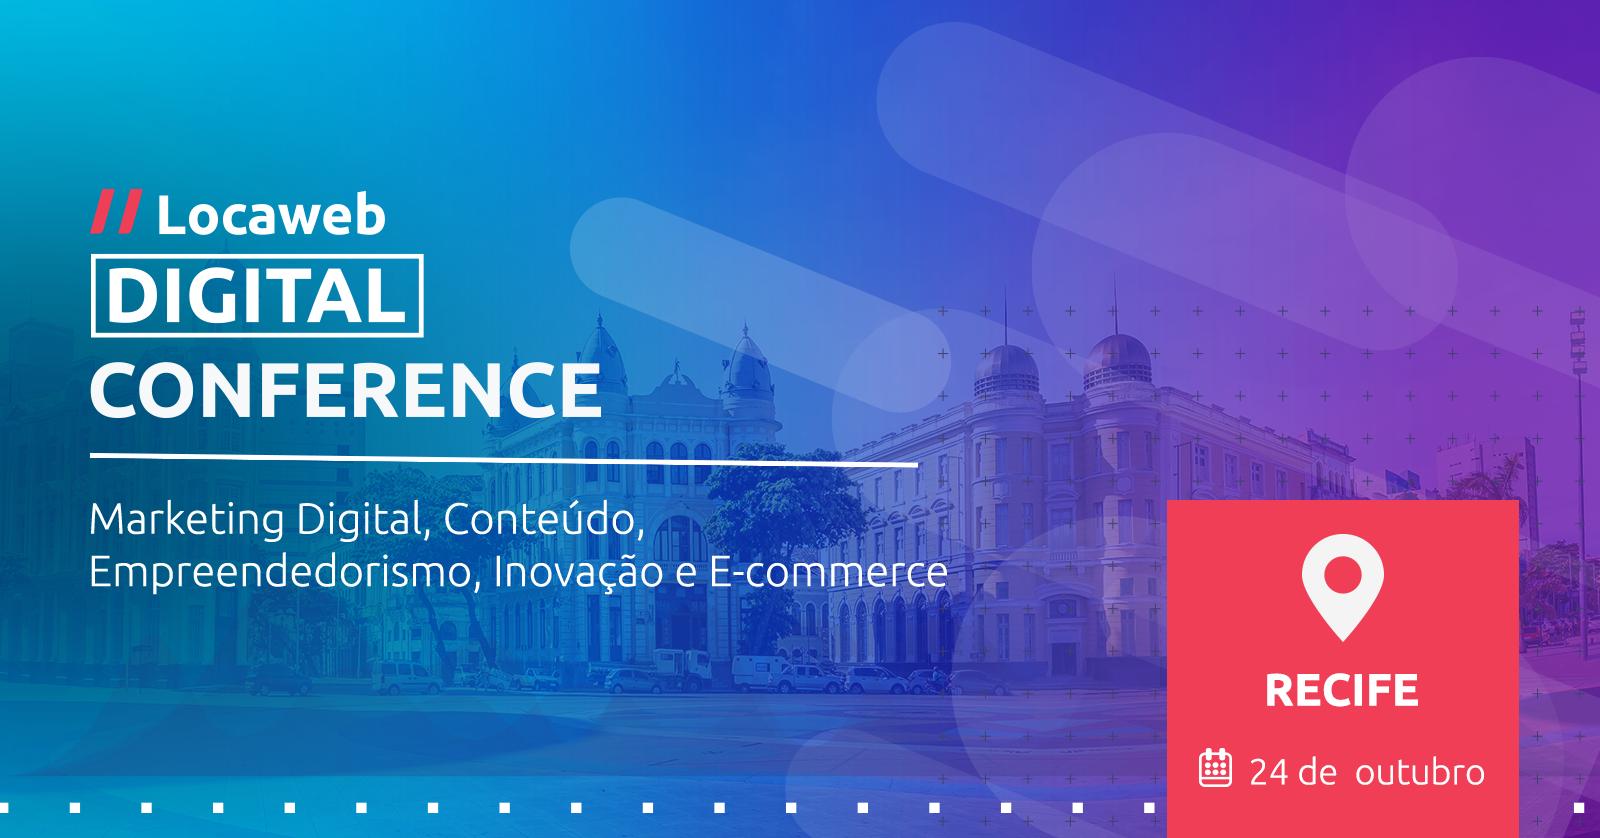 Resultado de imagem para Locaweb Digital Conference recife